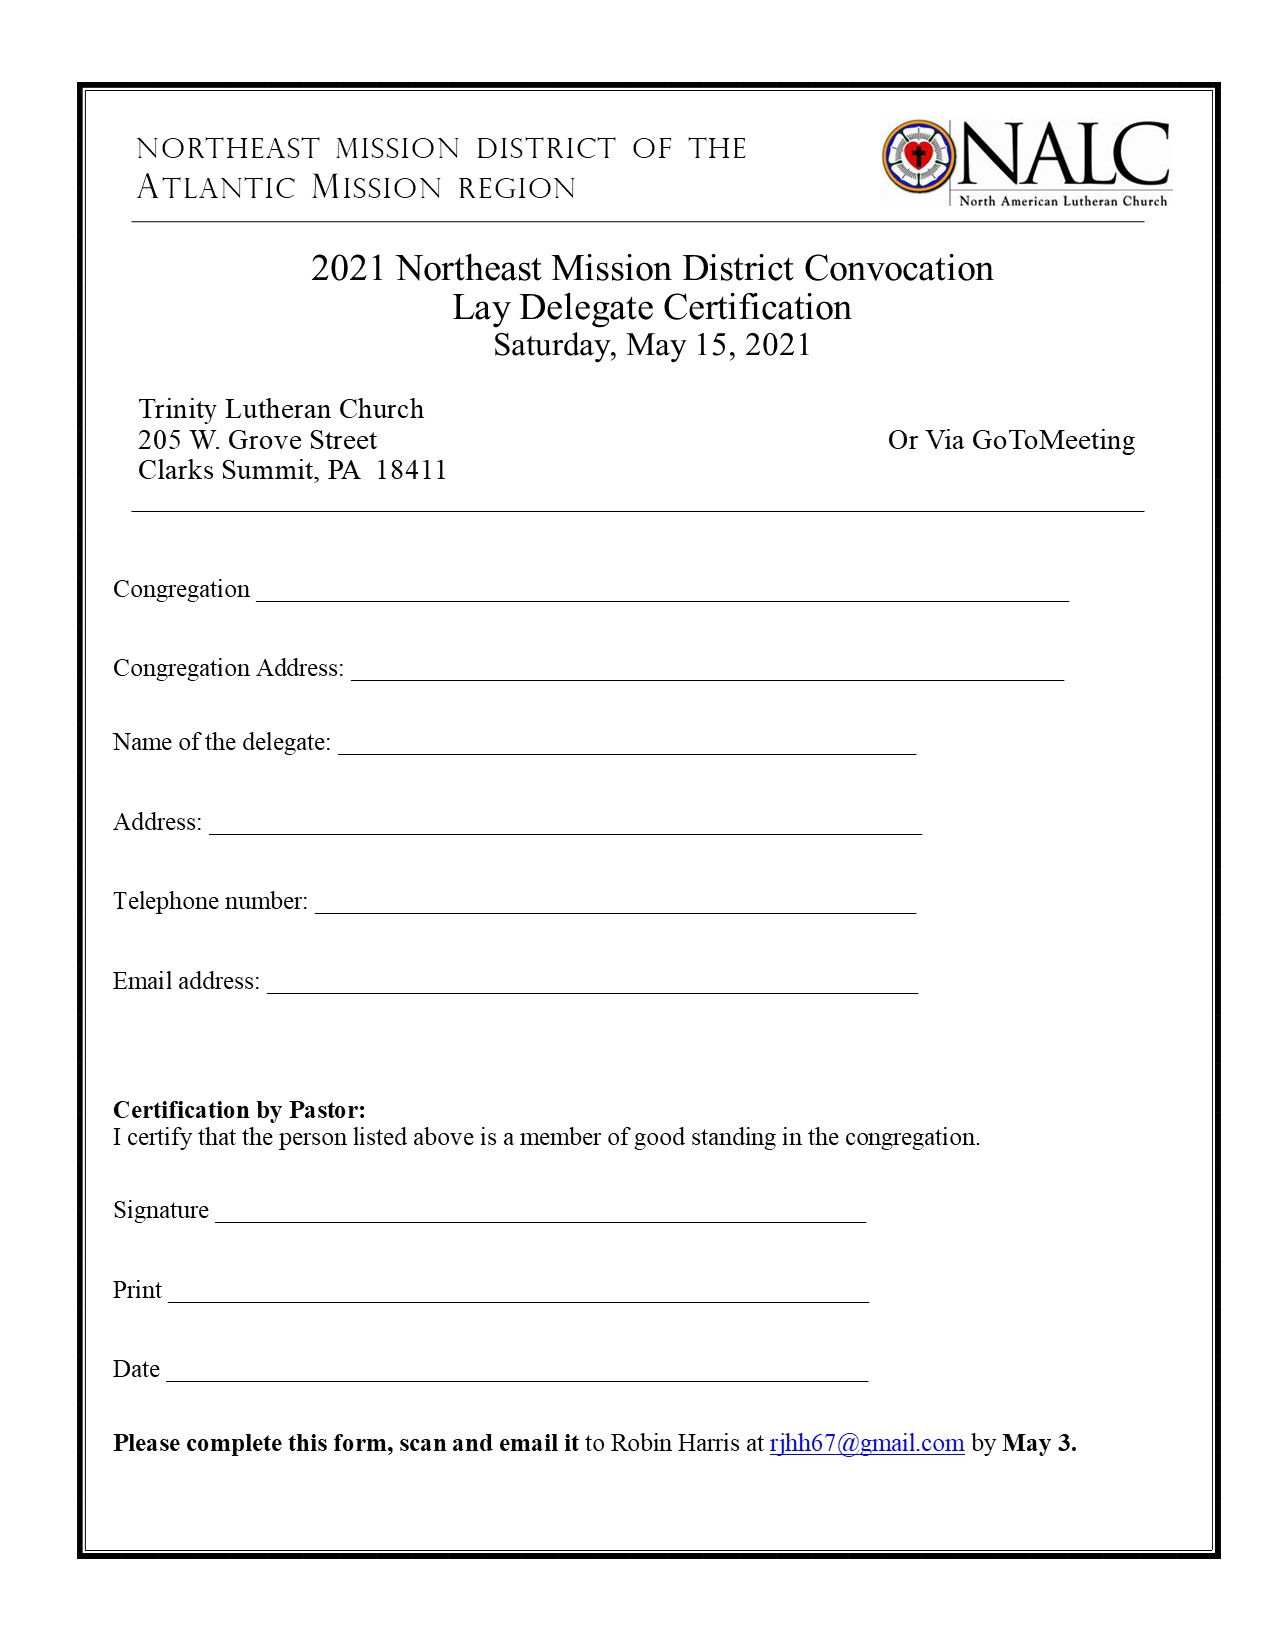 NEMD lay delegate certification